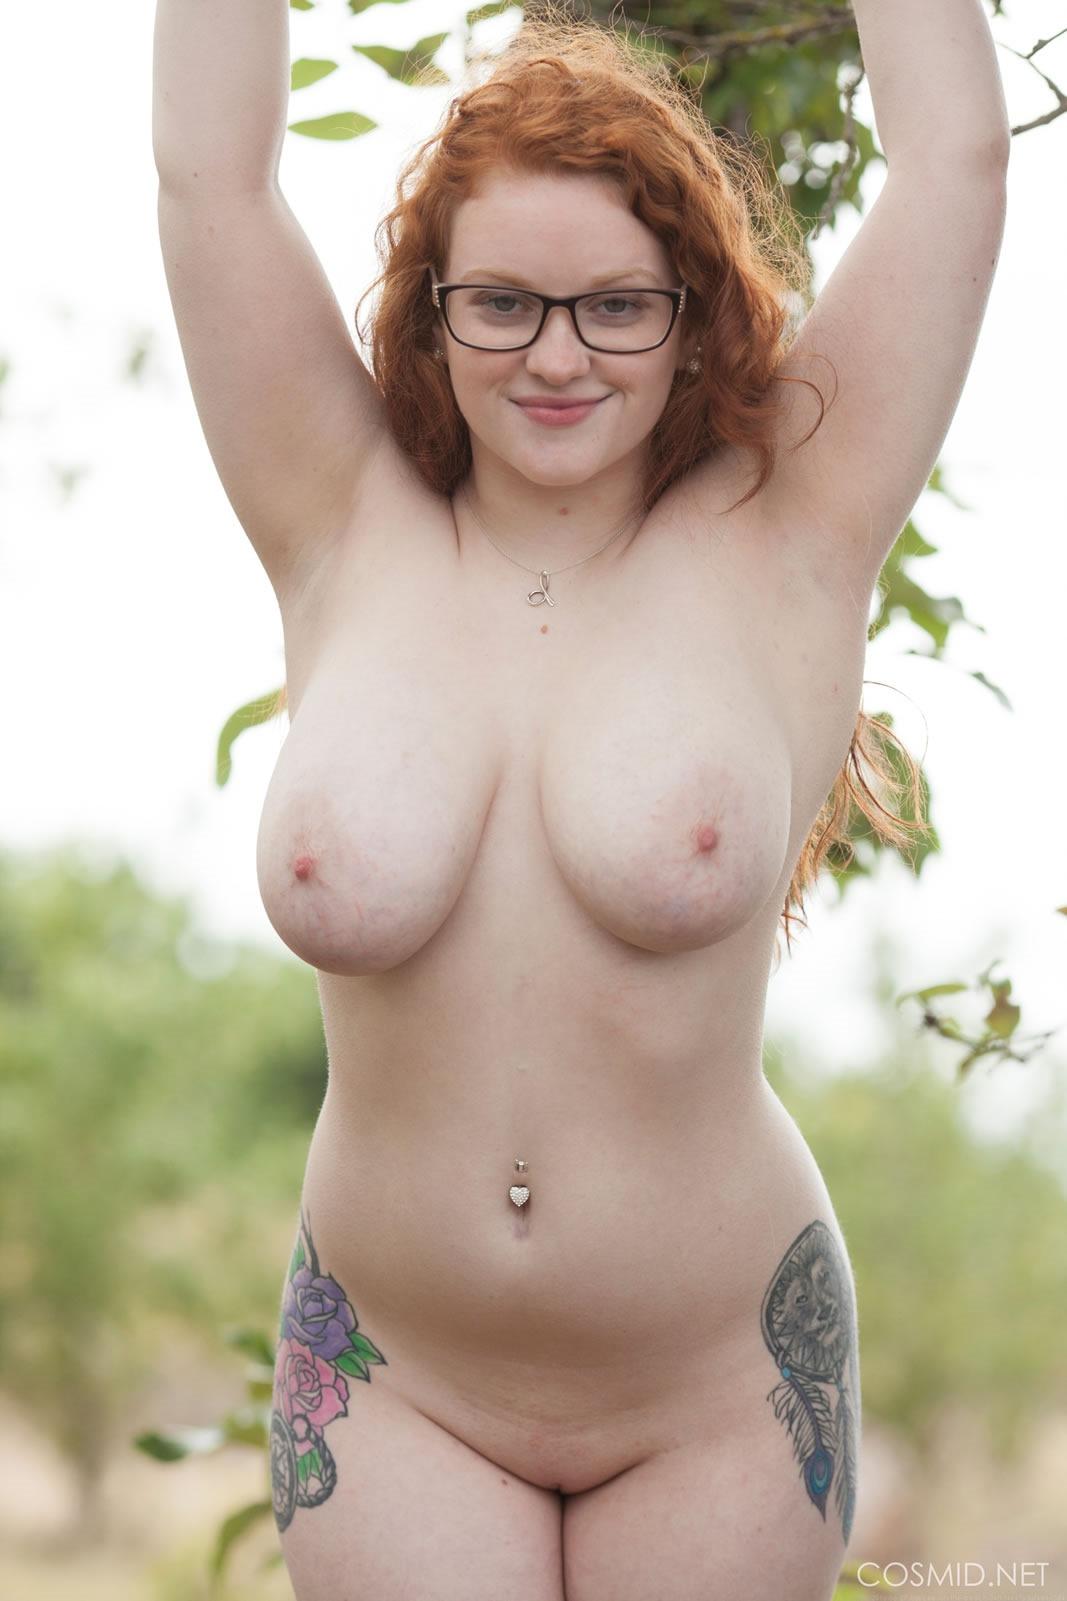 Dutch upskirt panties